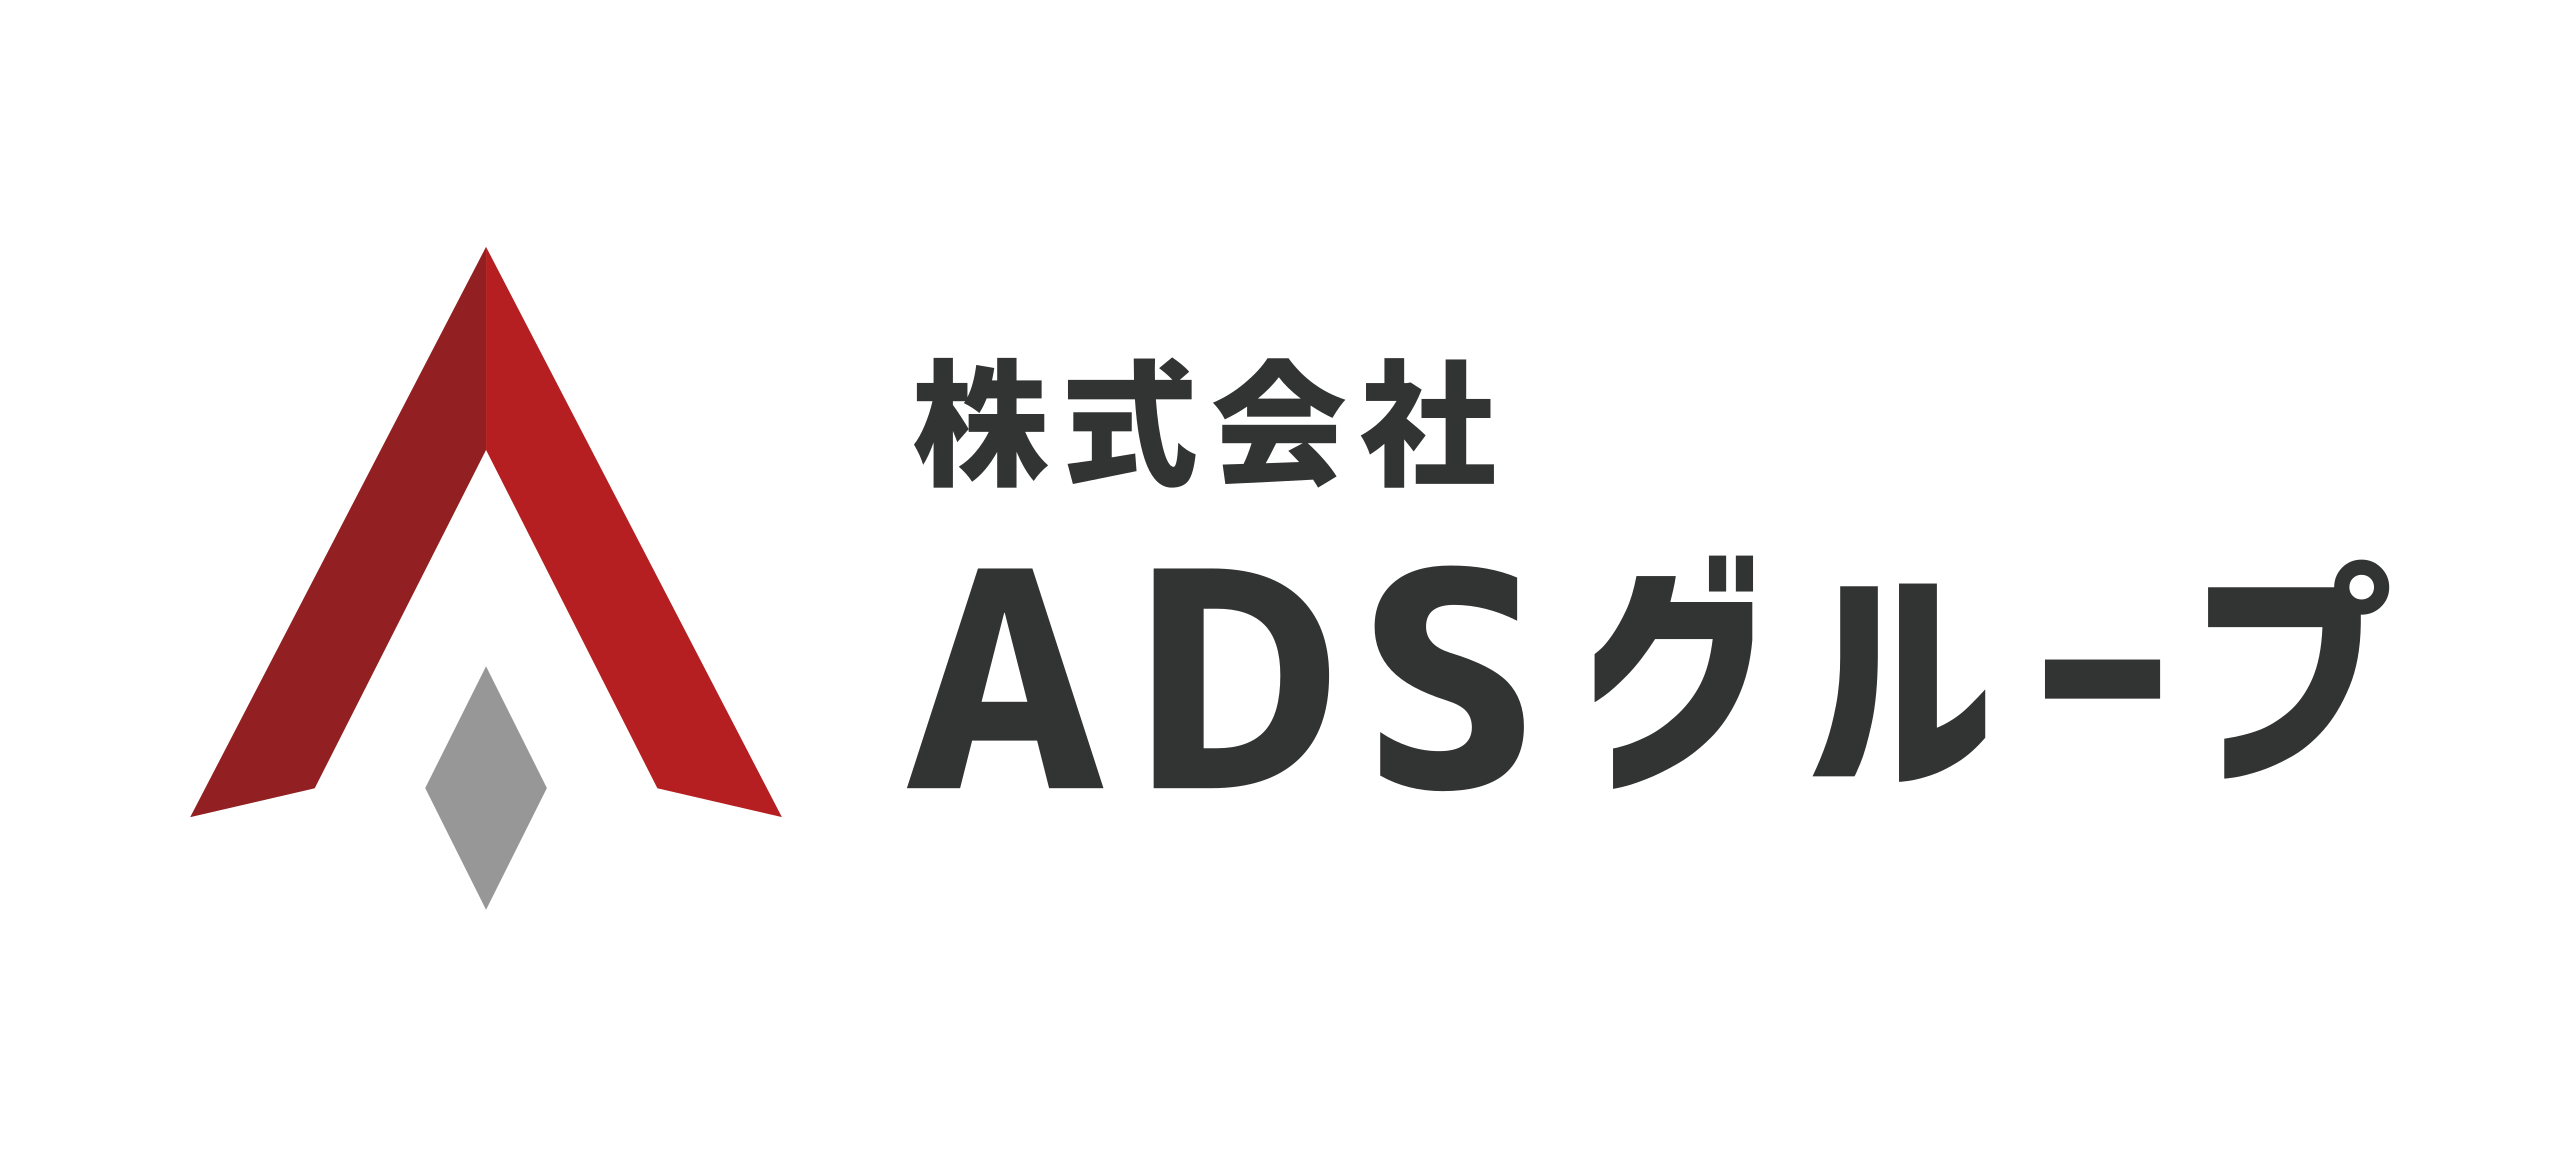 株式会社 ADS